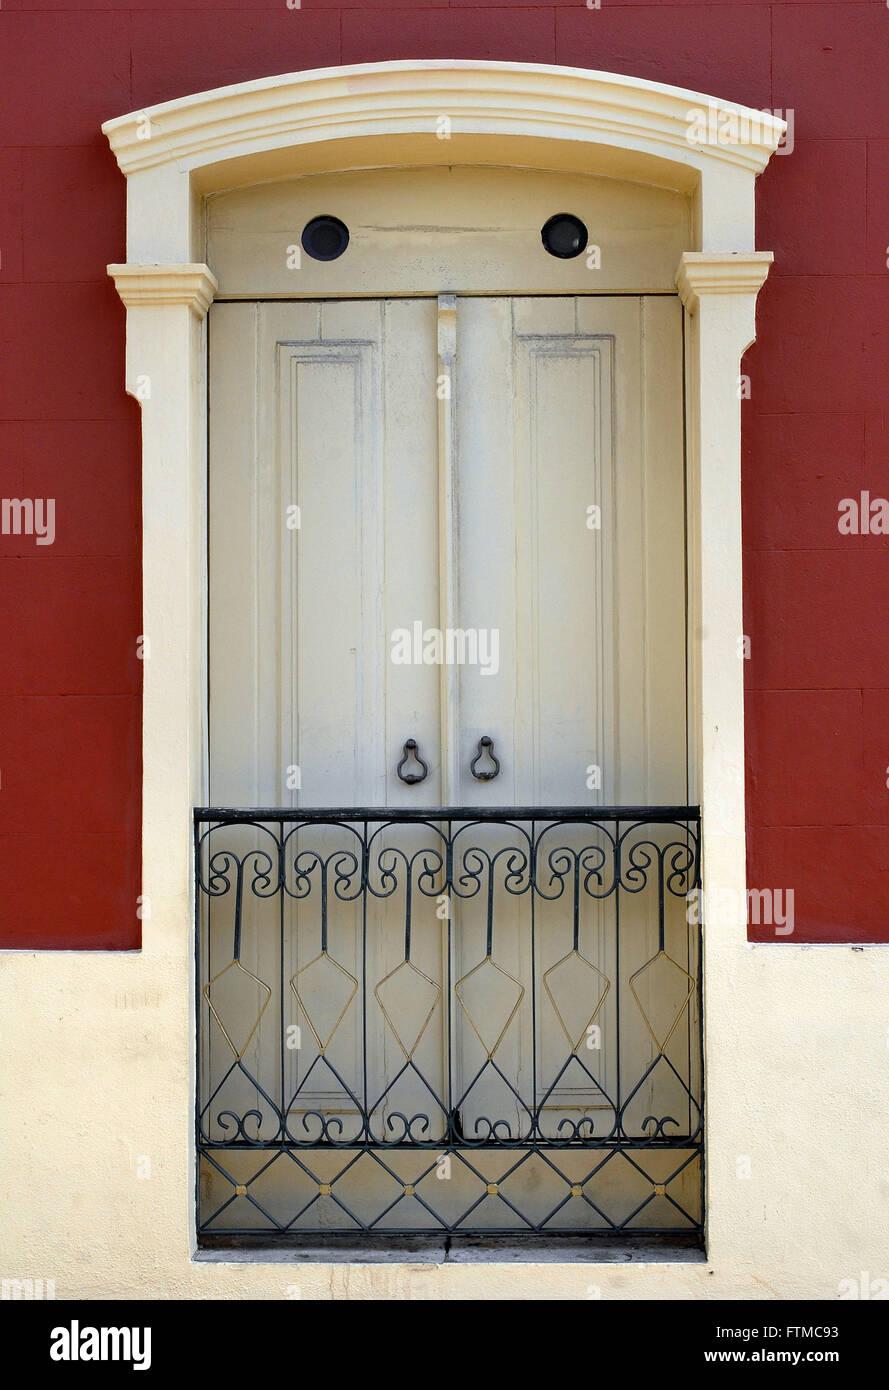 Window houses the city of Sao Luis - Stock Image